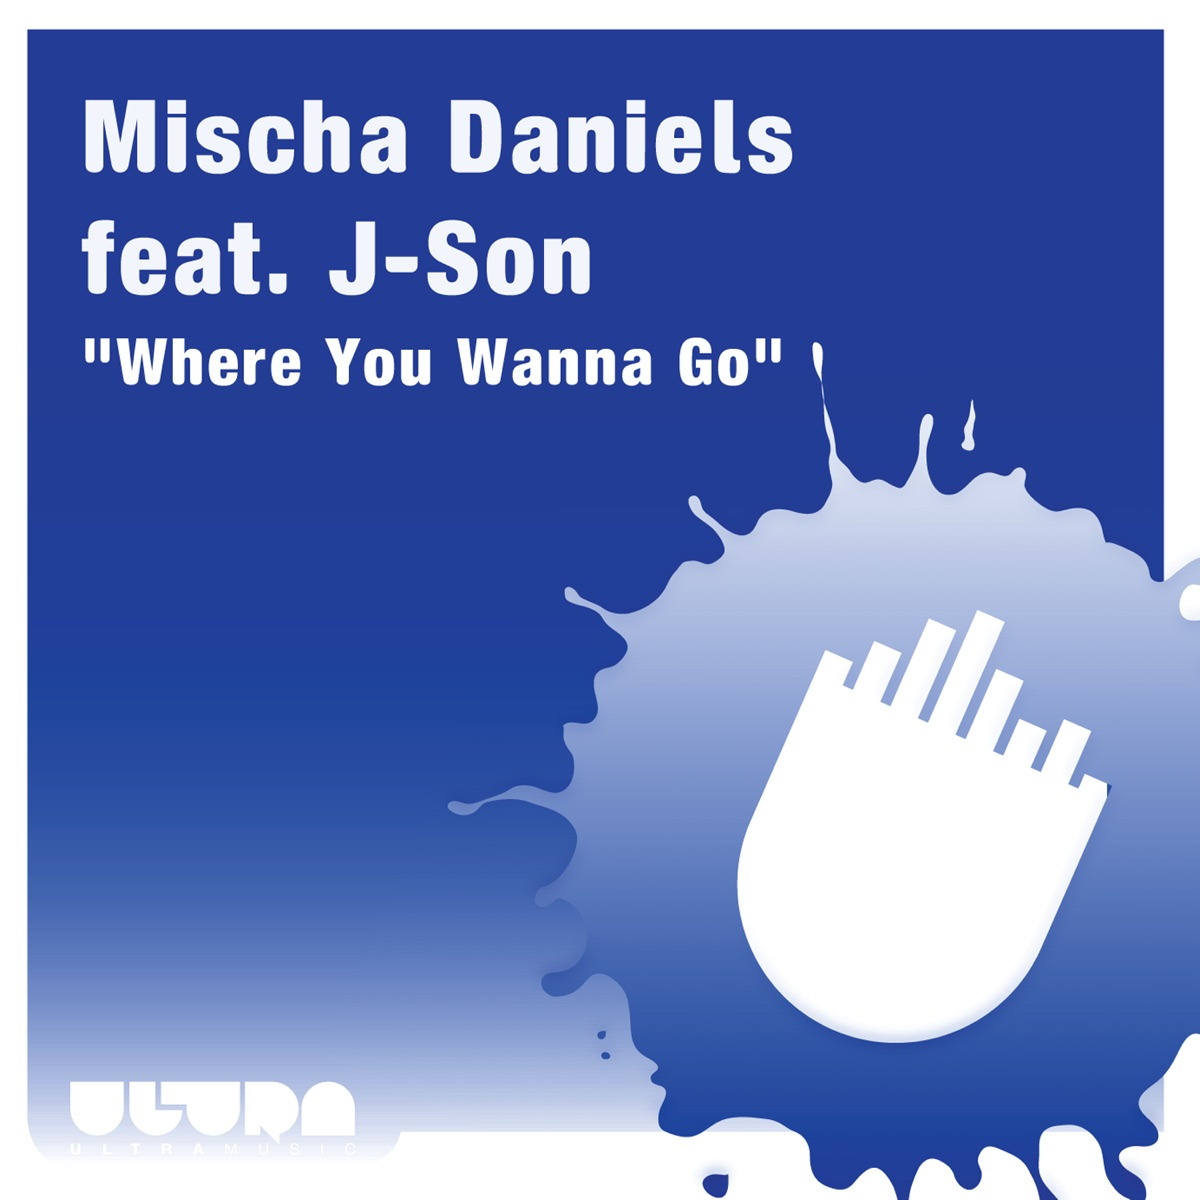 Where You Wanna Go Feat J-son - EP Mischa Daniels CD cover